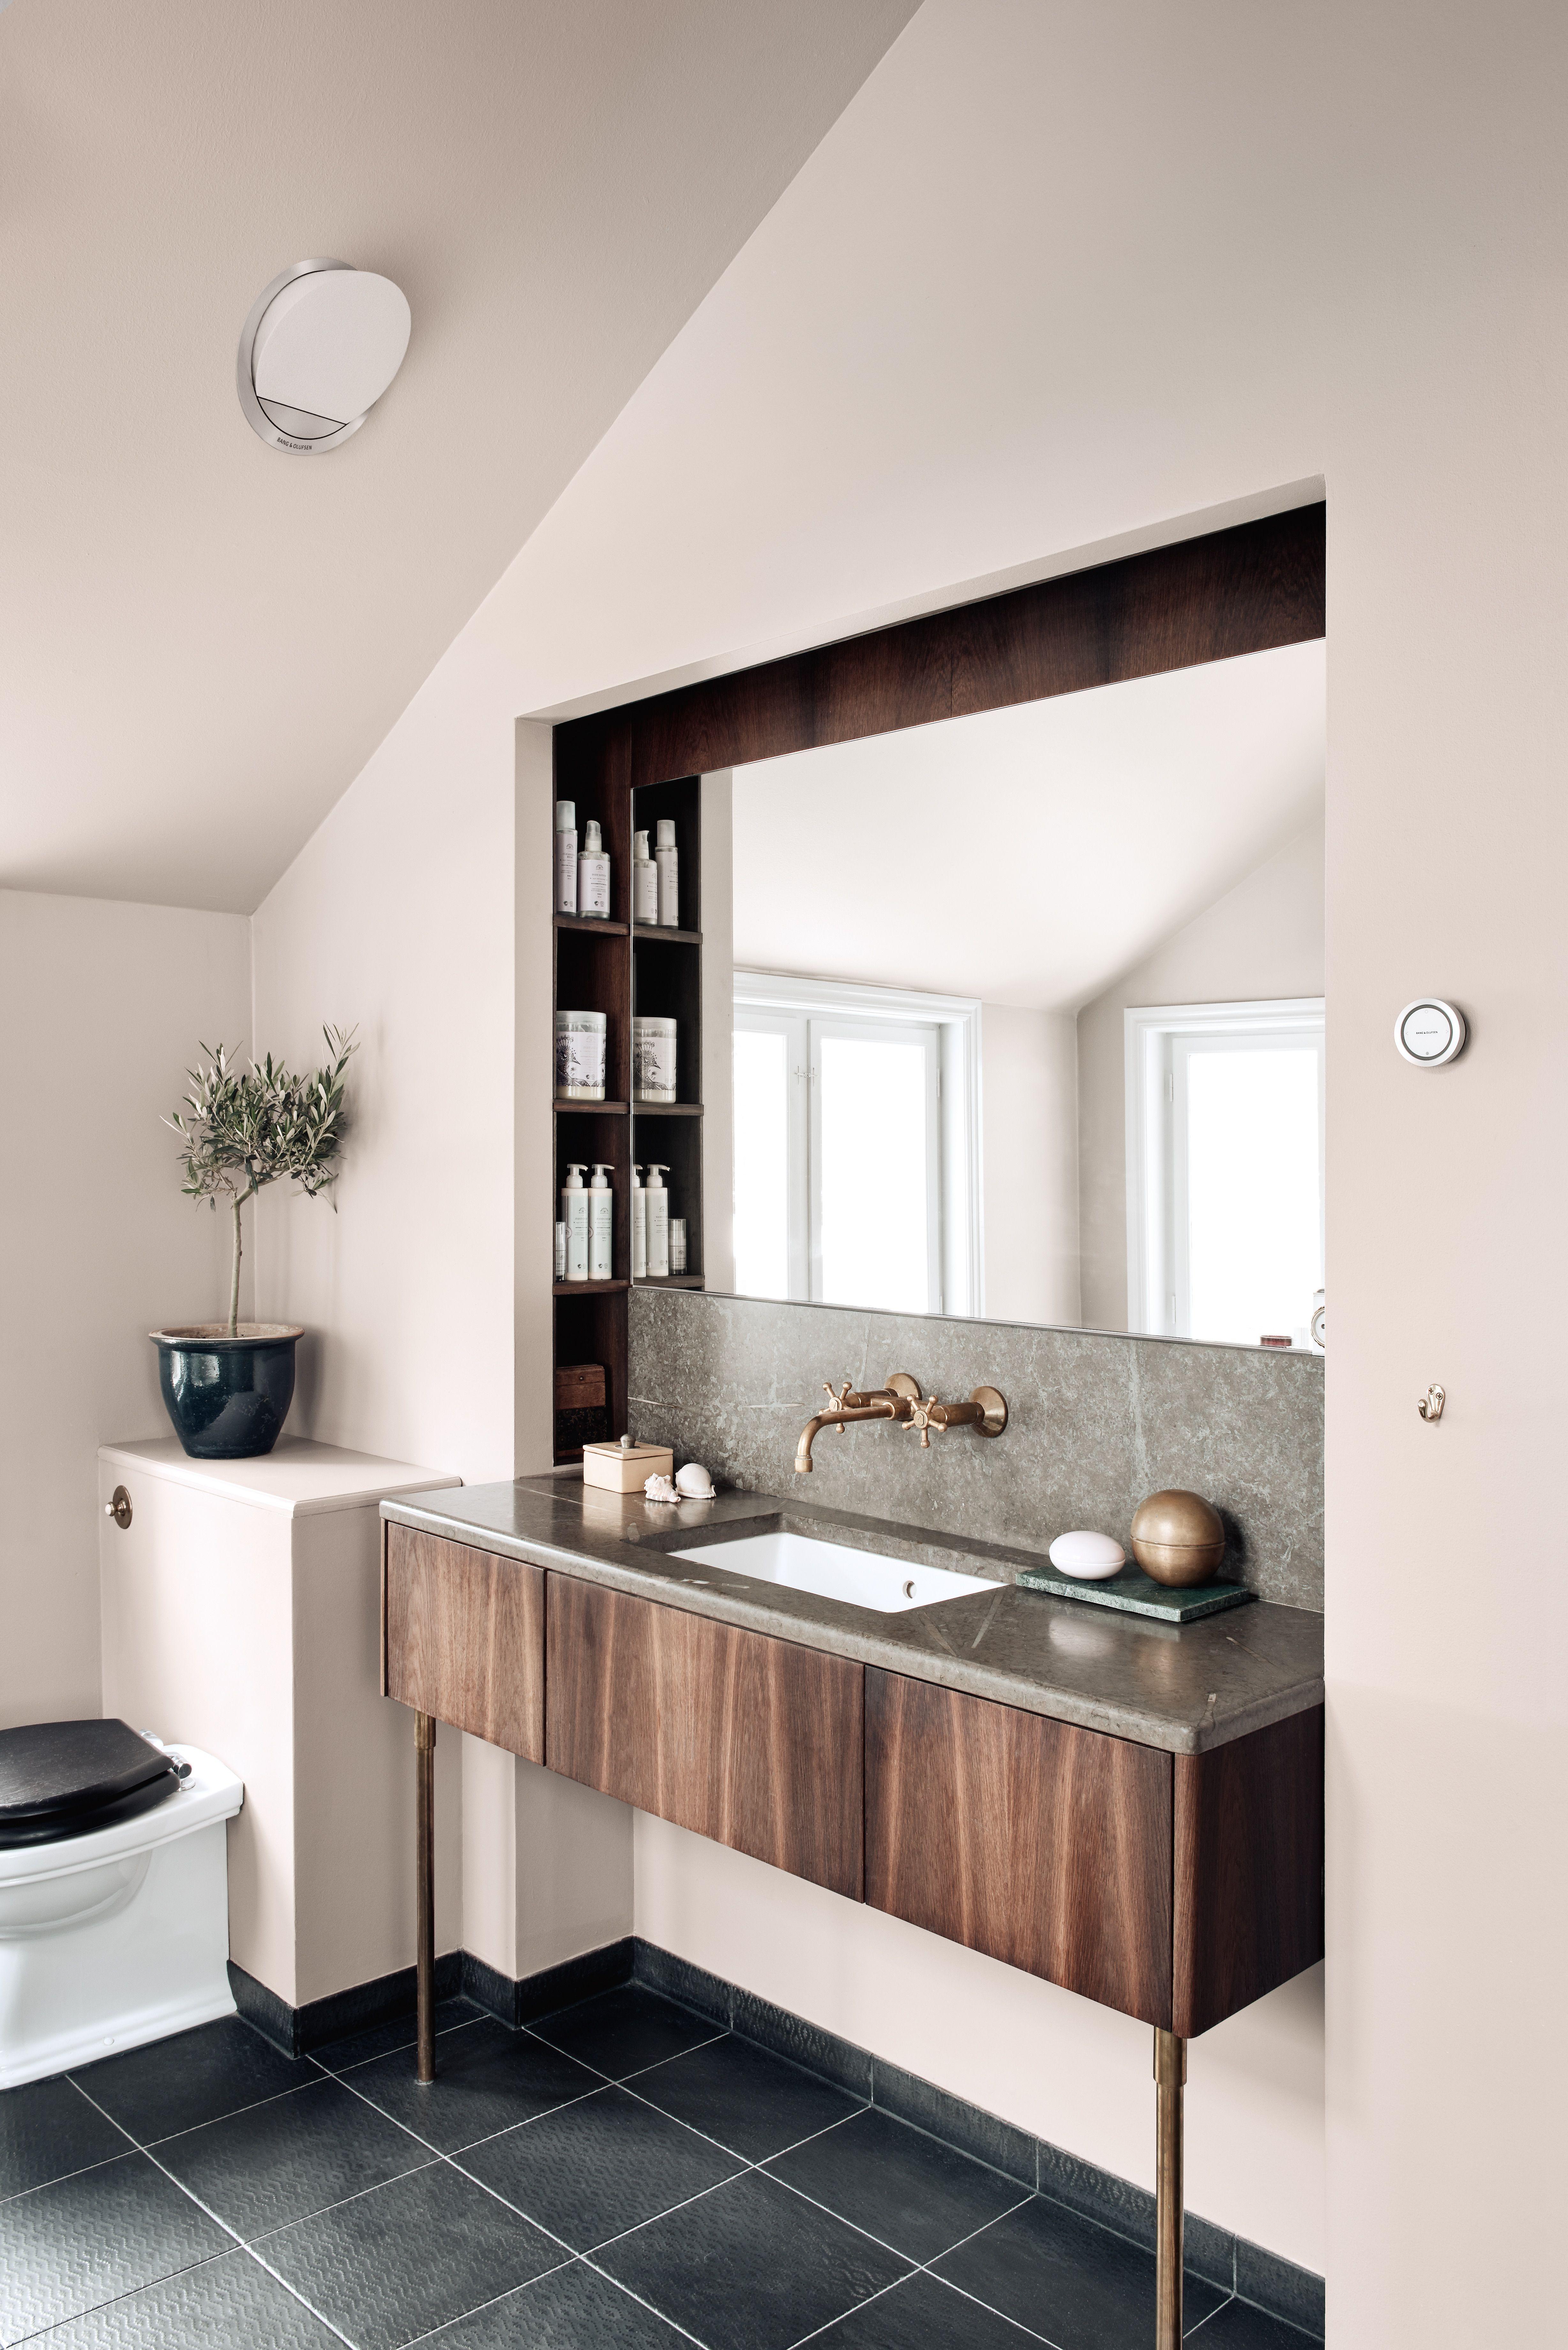 Beovox 2 Can Be Placed Wherever You Like Bathroom Bathroom